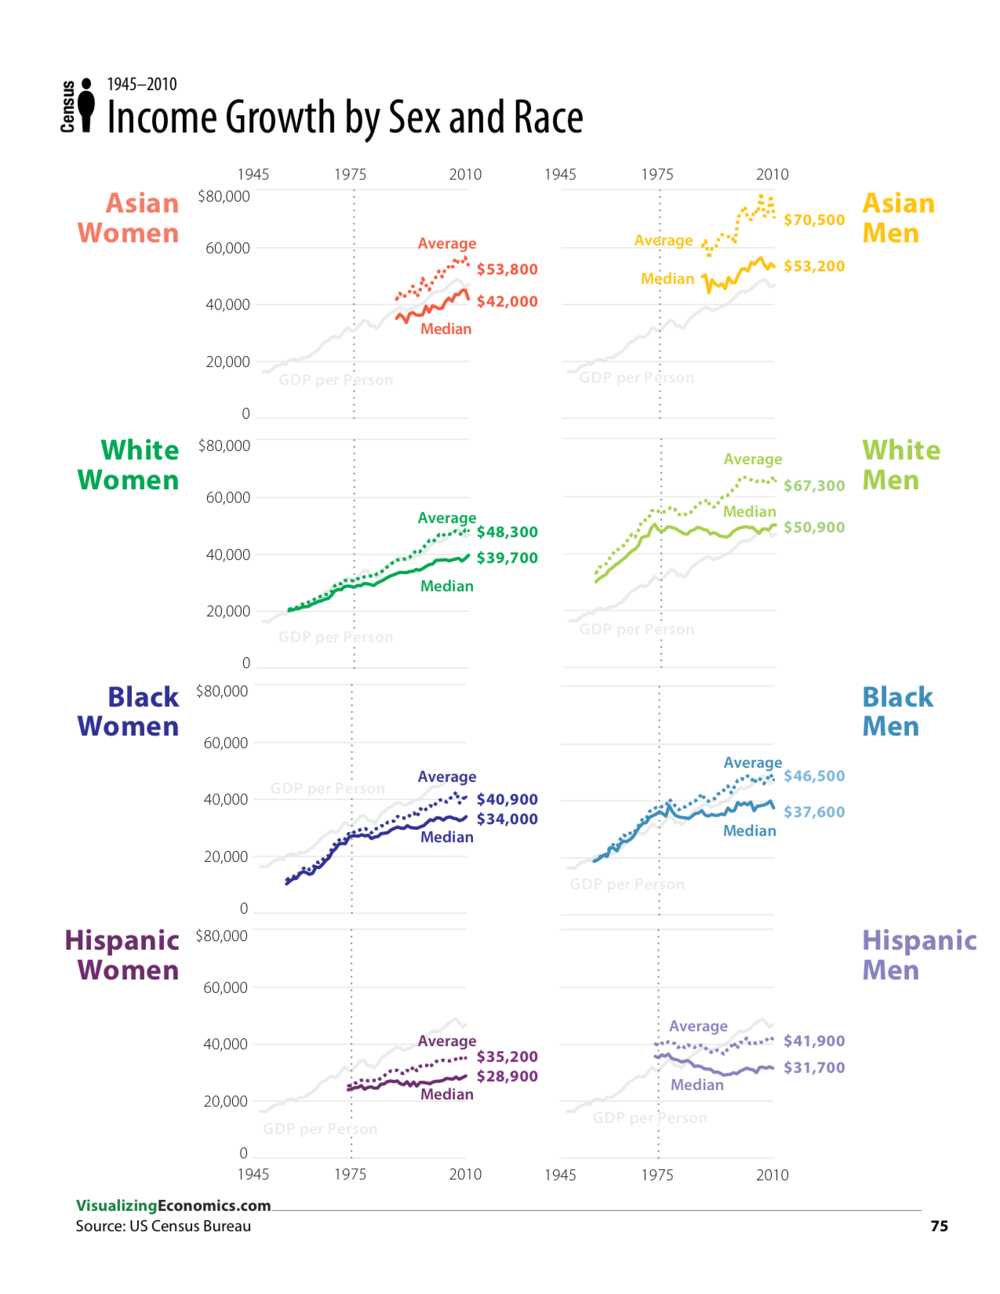 visualizingeconomics.com